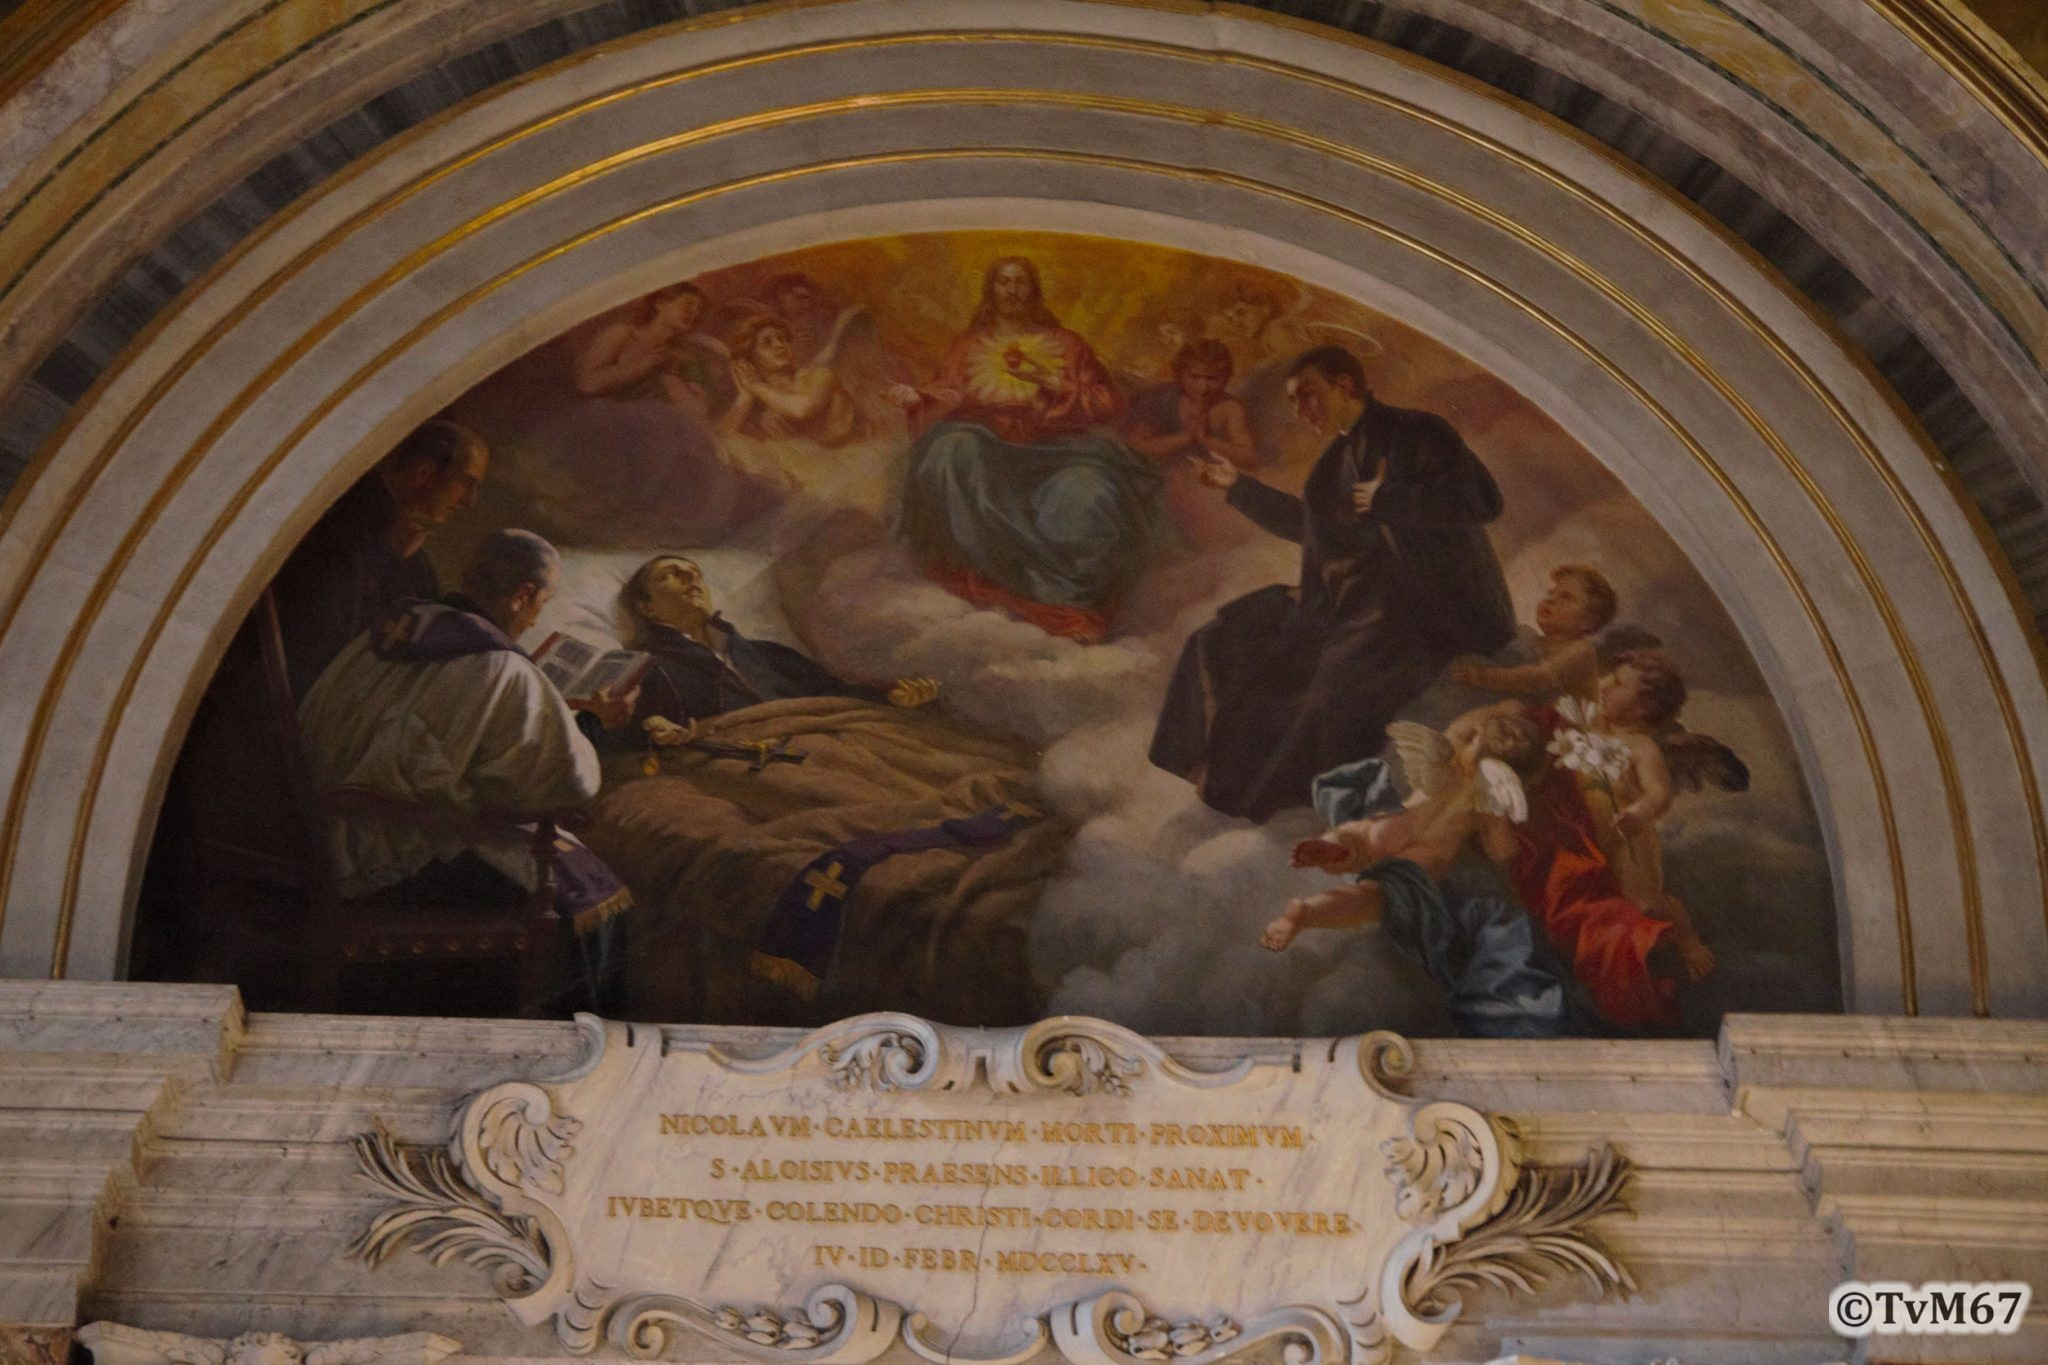 Cappella del Crocifisso, lunet links